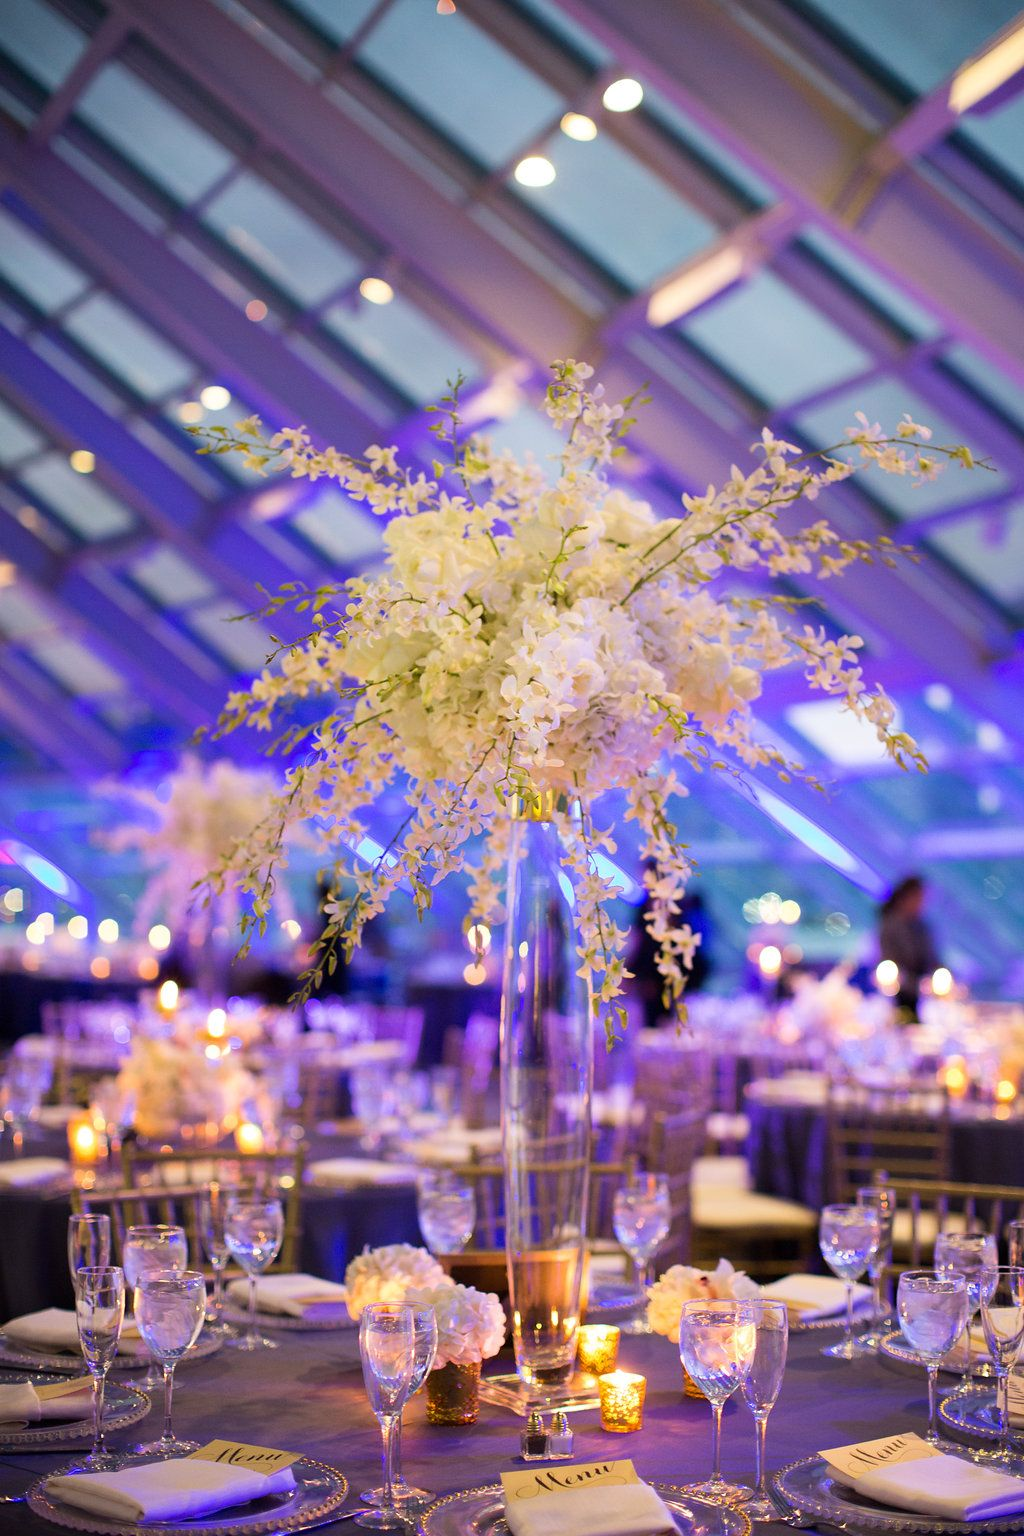 Towering Centerpieces / Indian Wedding / Summer Wedding